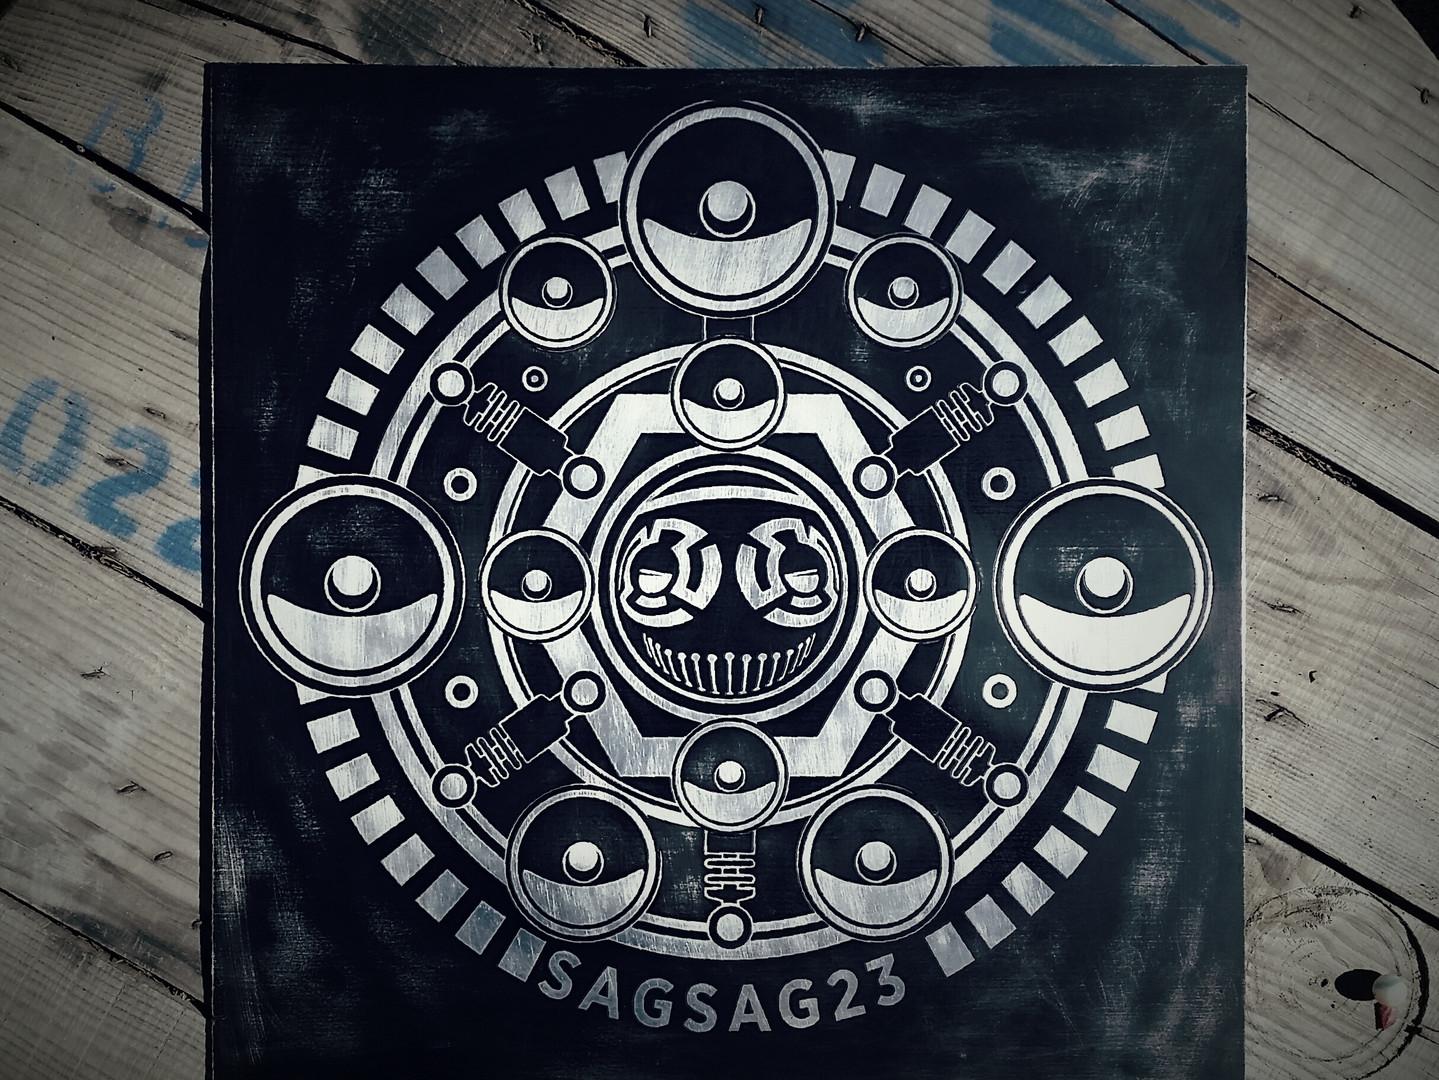 Plaque Sagsag 23